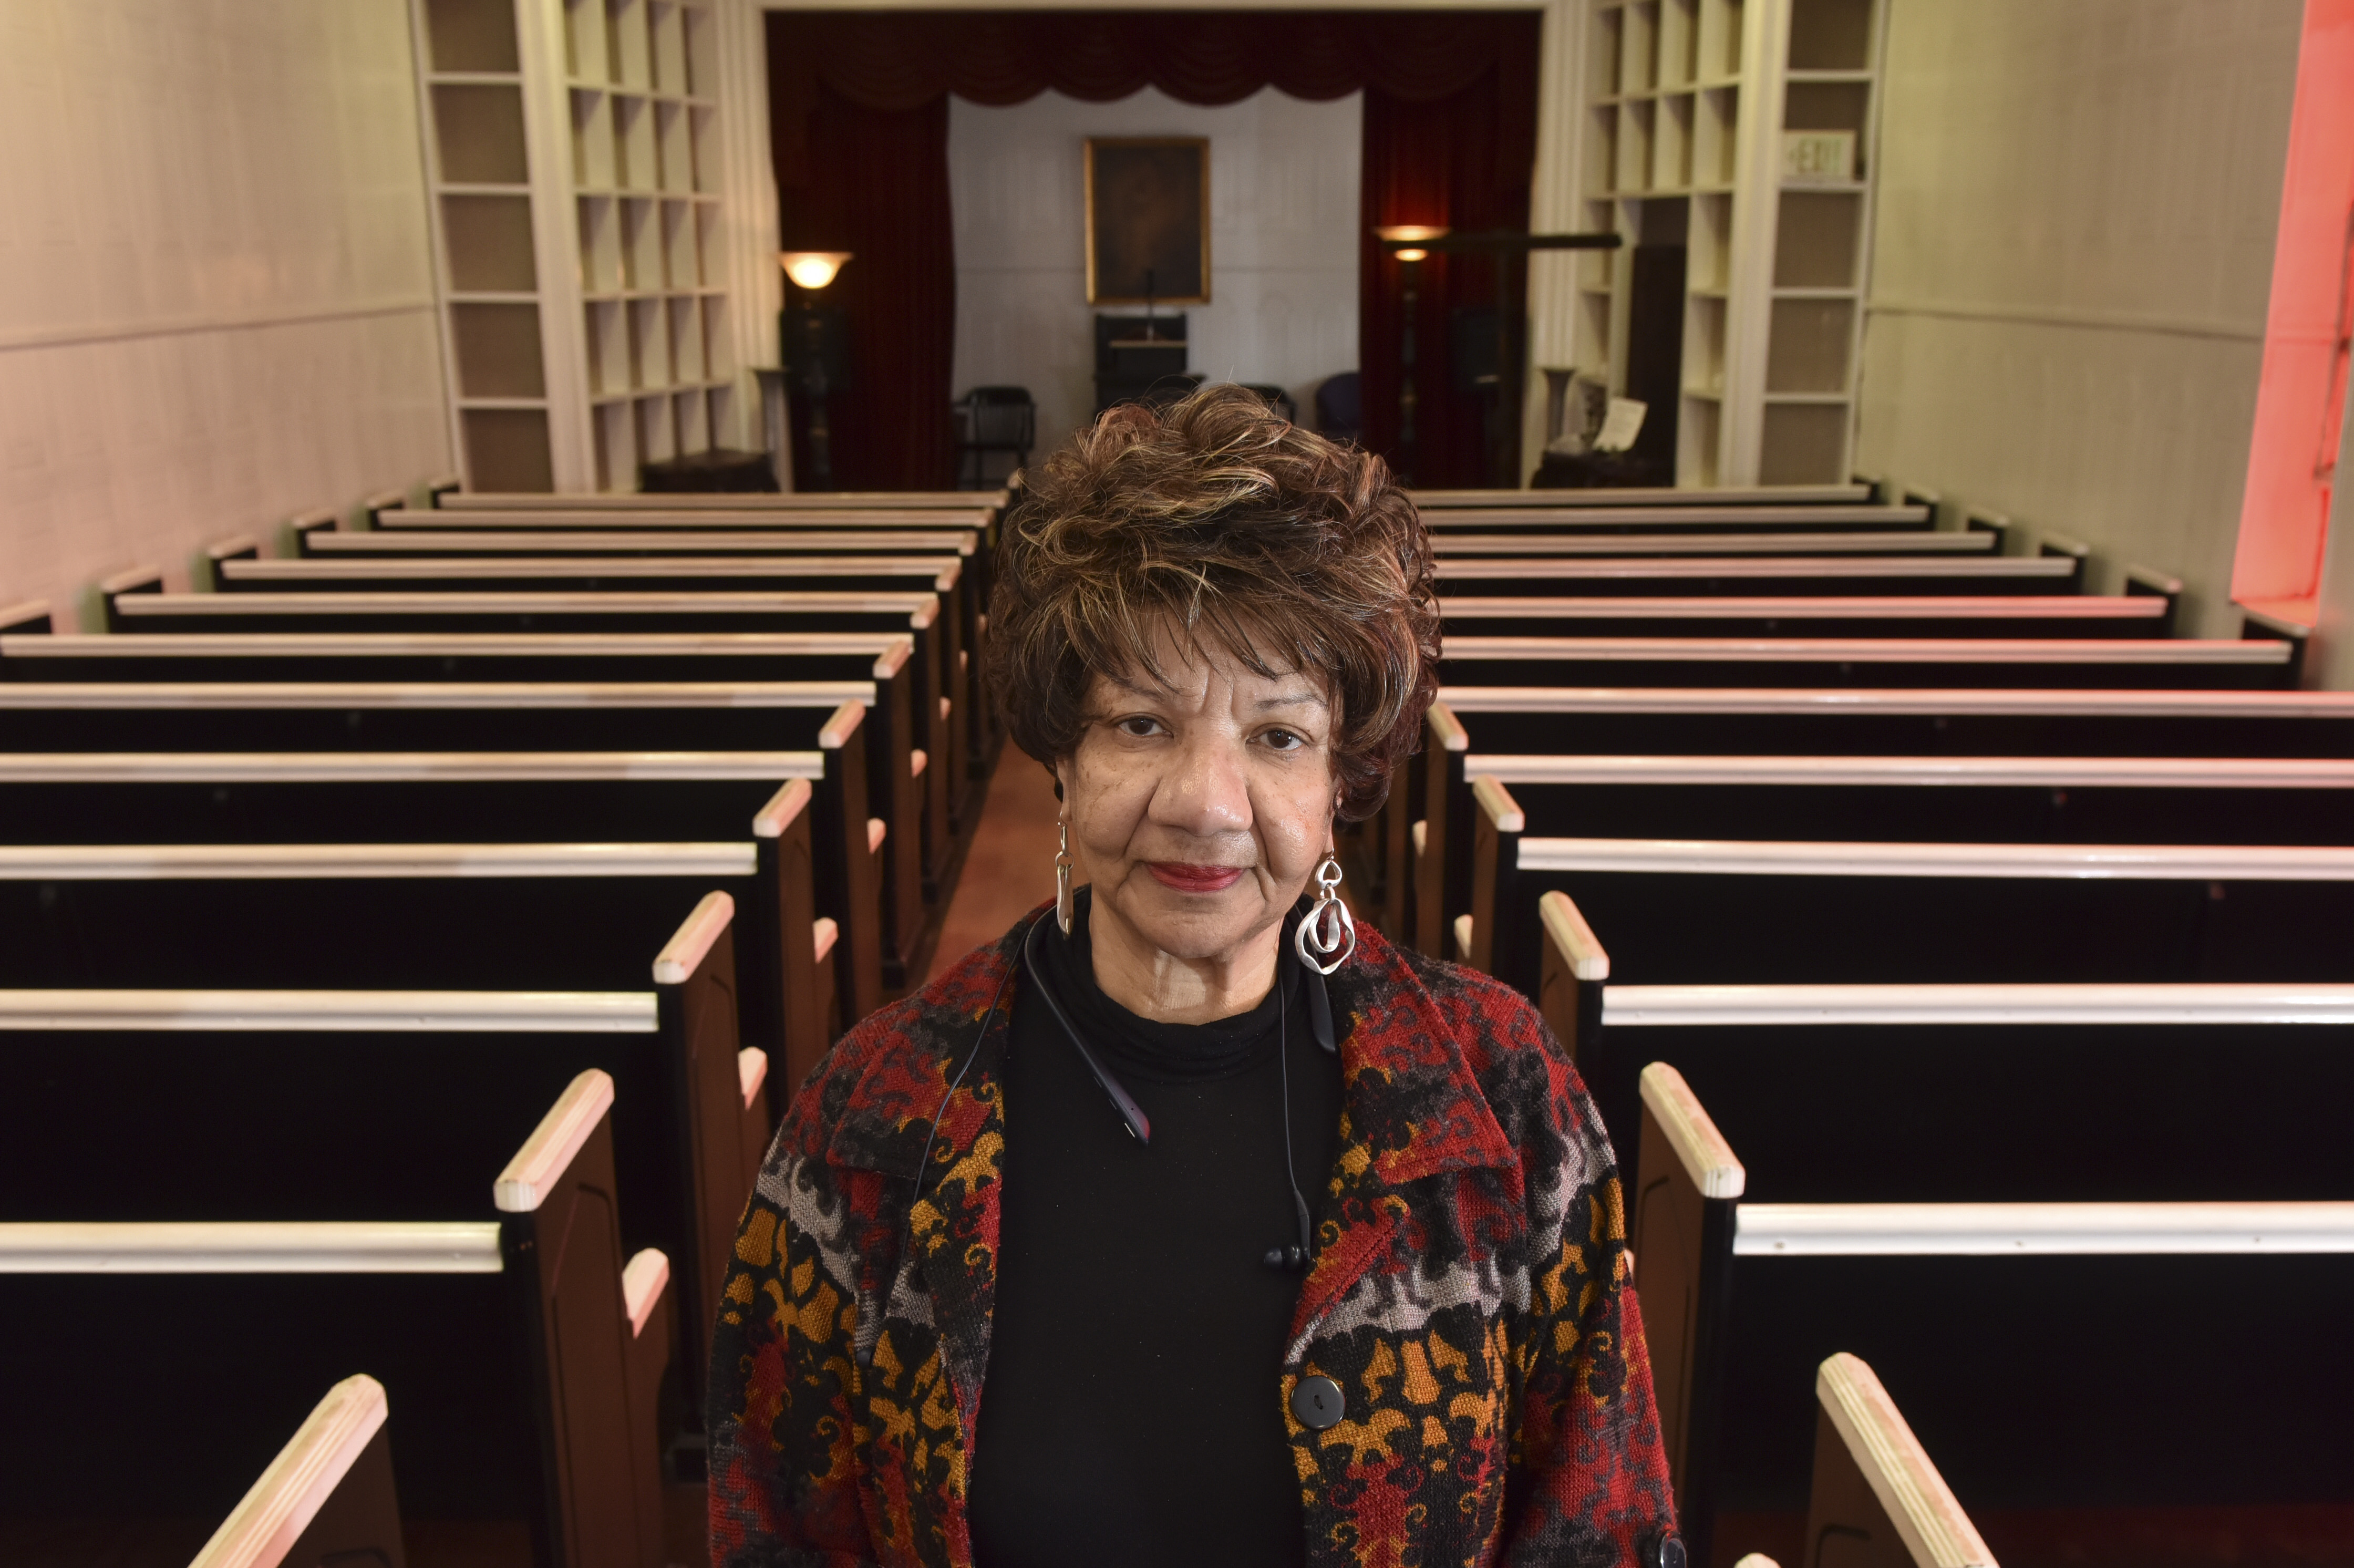 Poole Funeral Home In Birmingham Alabama